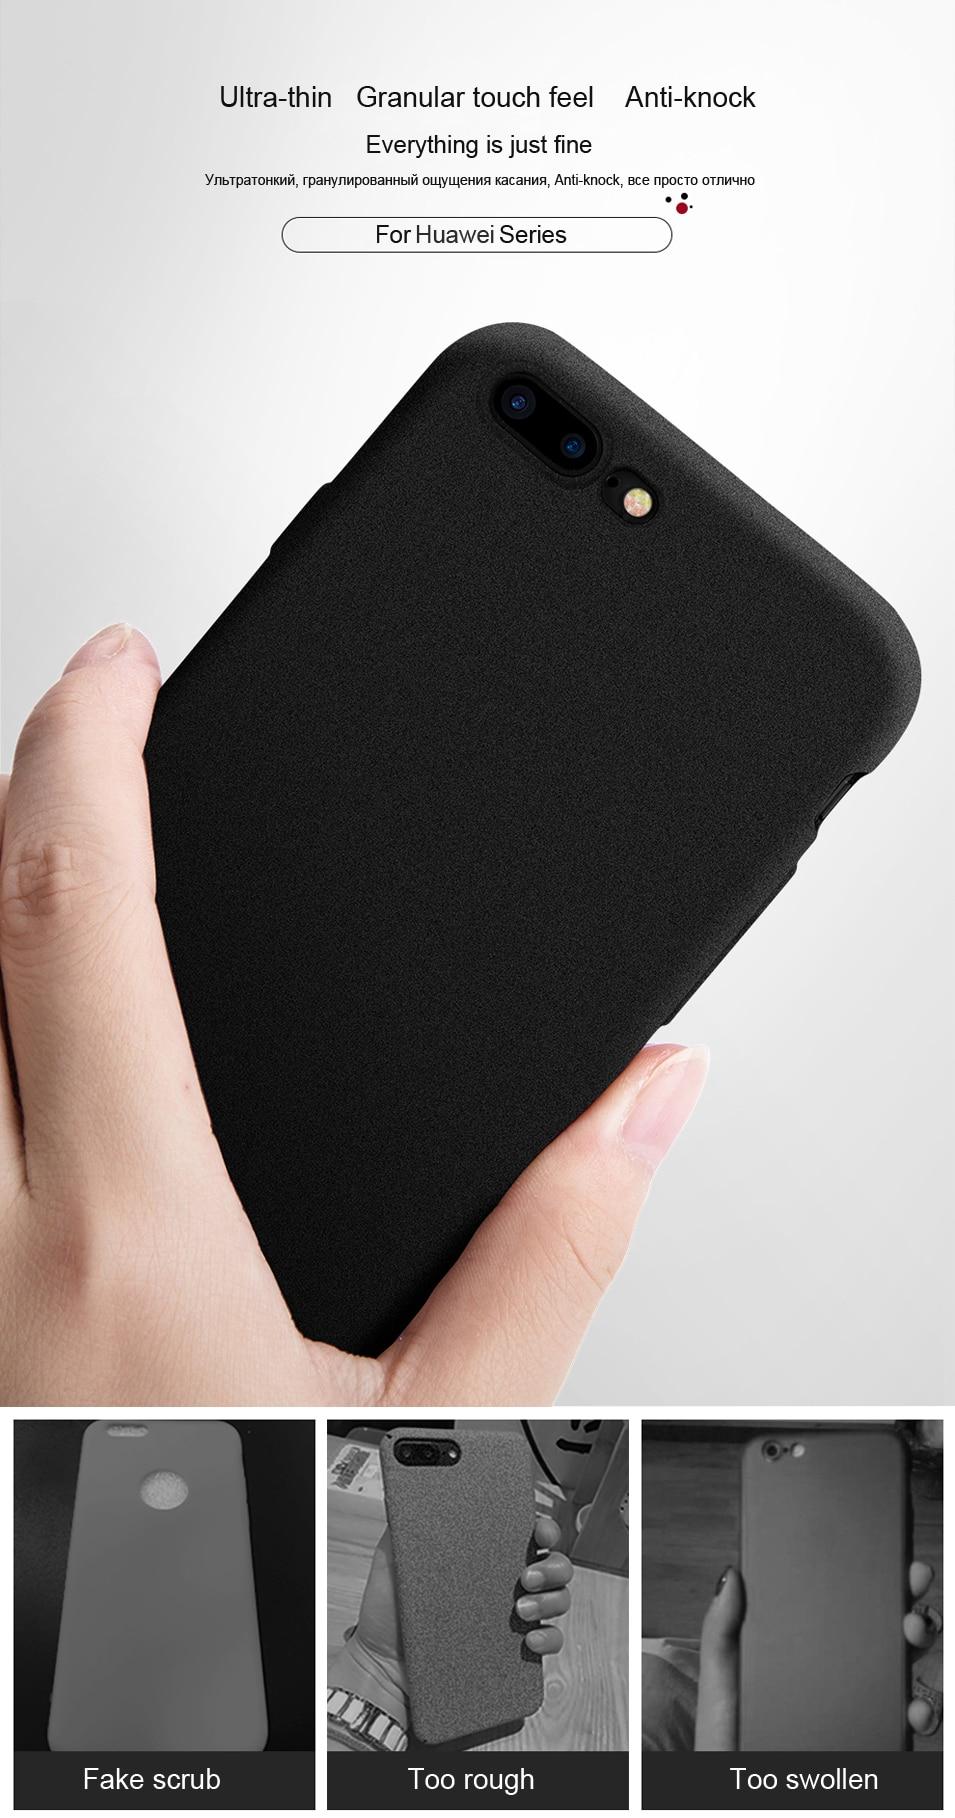 TPU Matte Fitted Case for Samsung Galaxy A3 A5 A7 J3 J5 J7 2016 2017 J3Pro J2 J5 J7 Prime Safety High Quality Soft Case Cover (9)